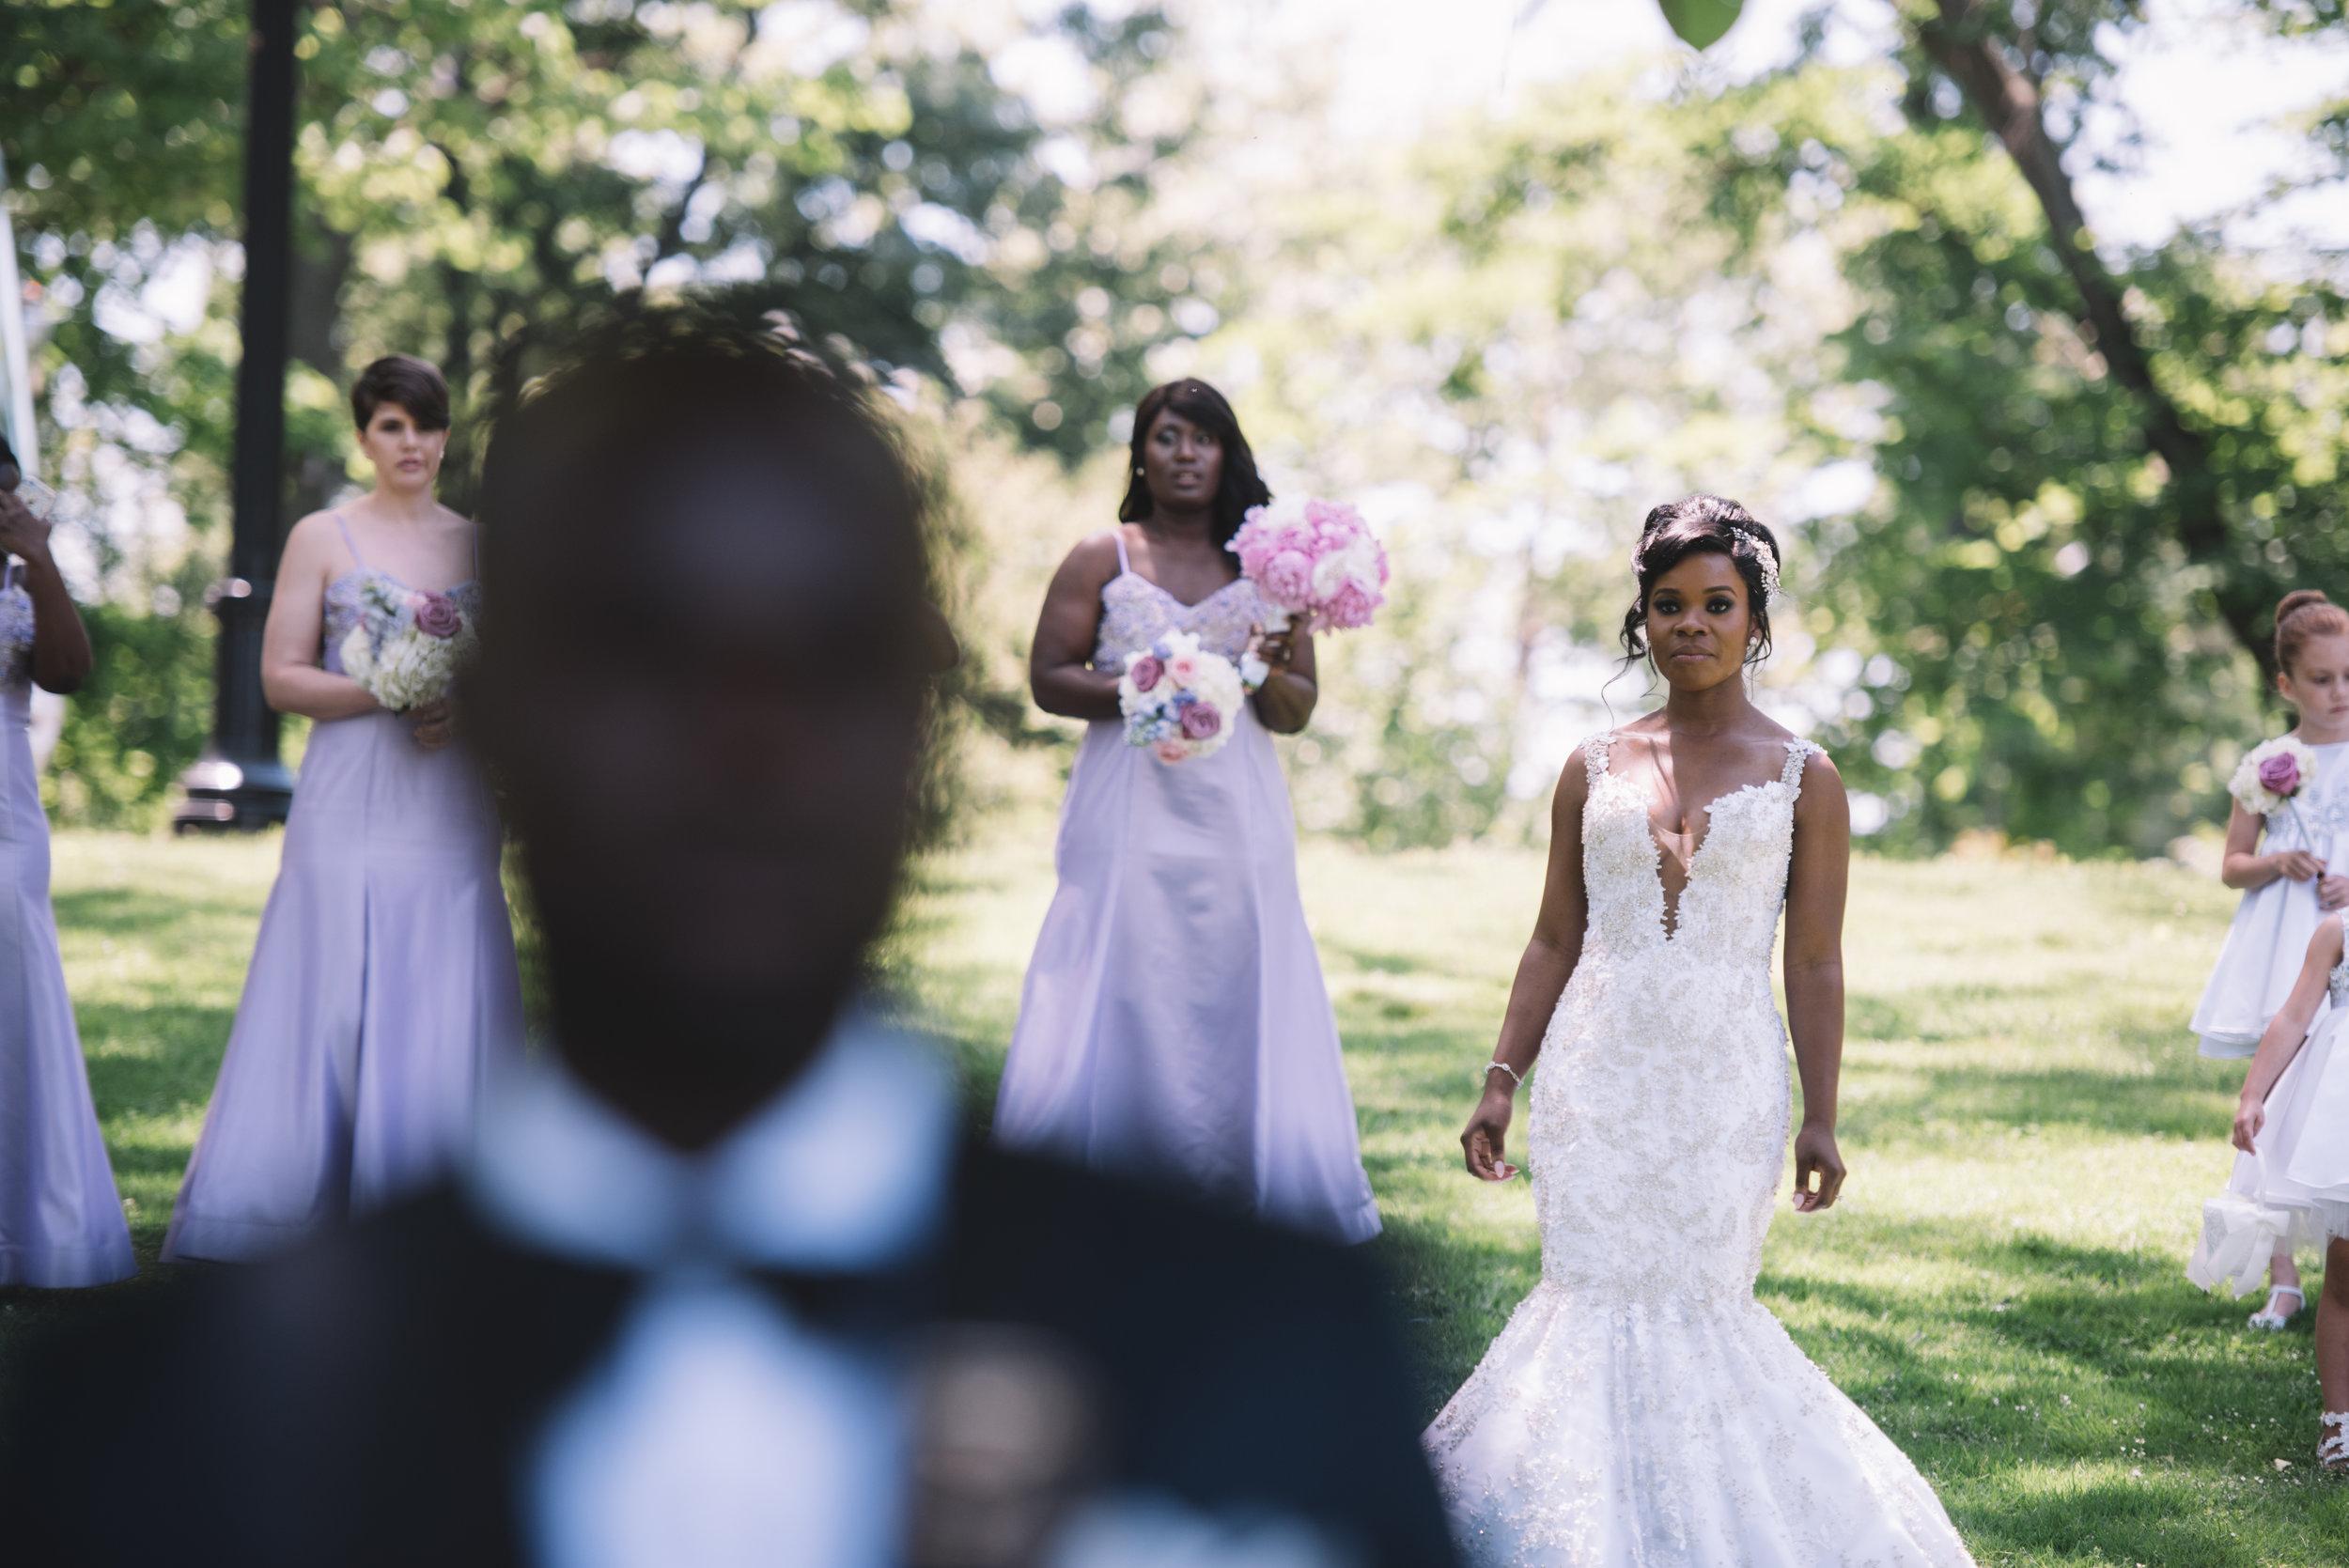 WeddingPhotos | NJPhotographer | Highlights-4-5.jpg